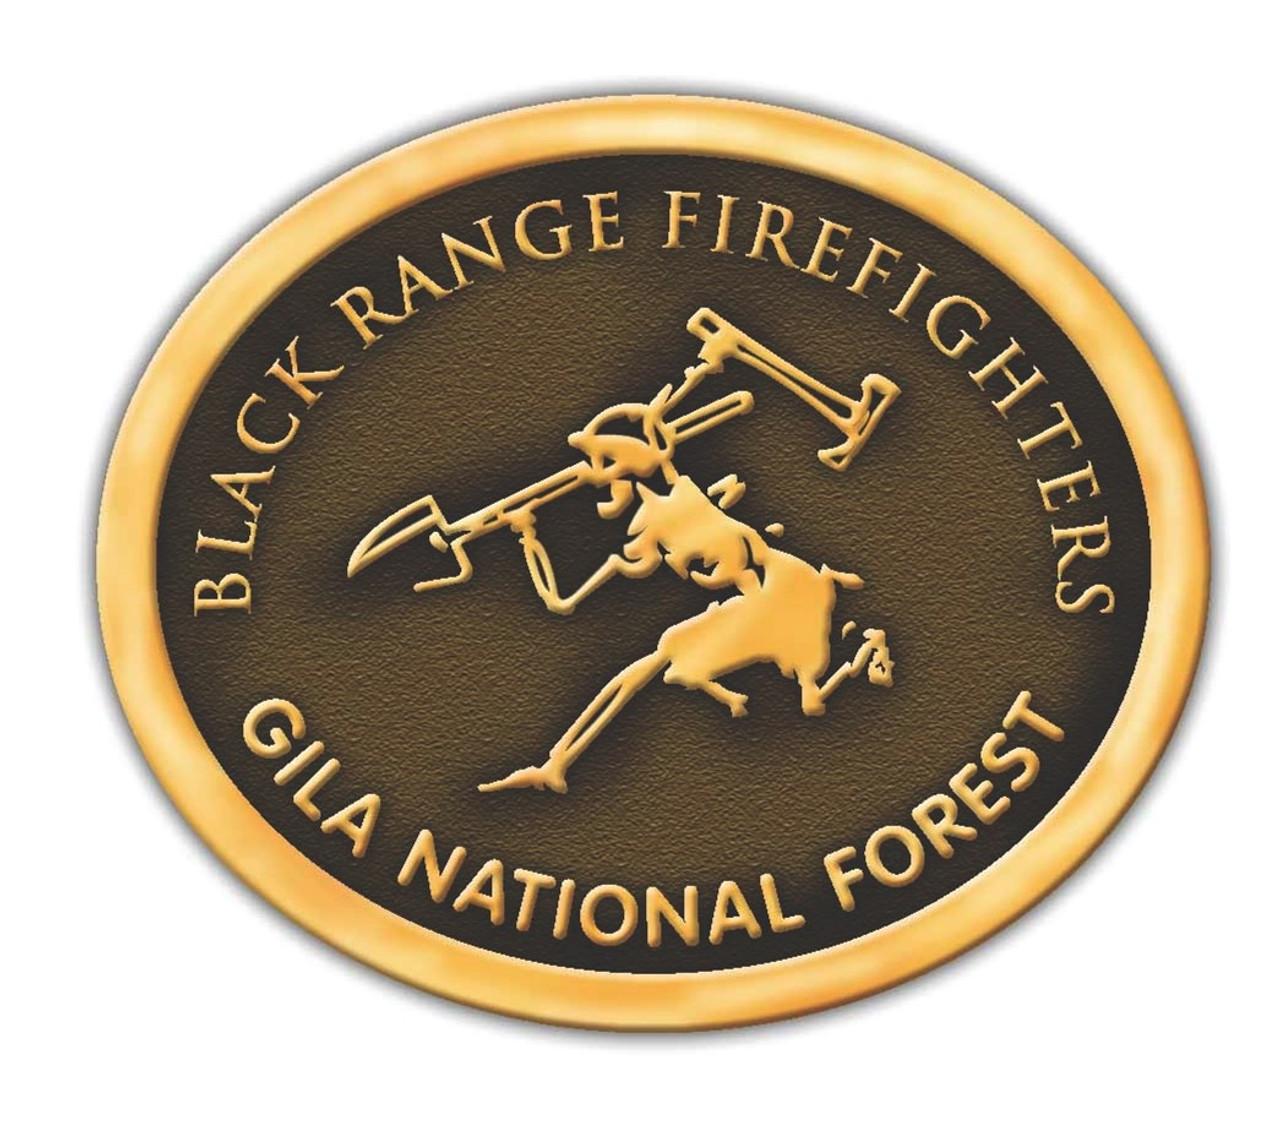 Black Range Firefighters Buckle (RESTRICTED)